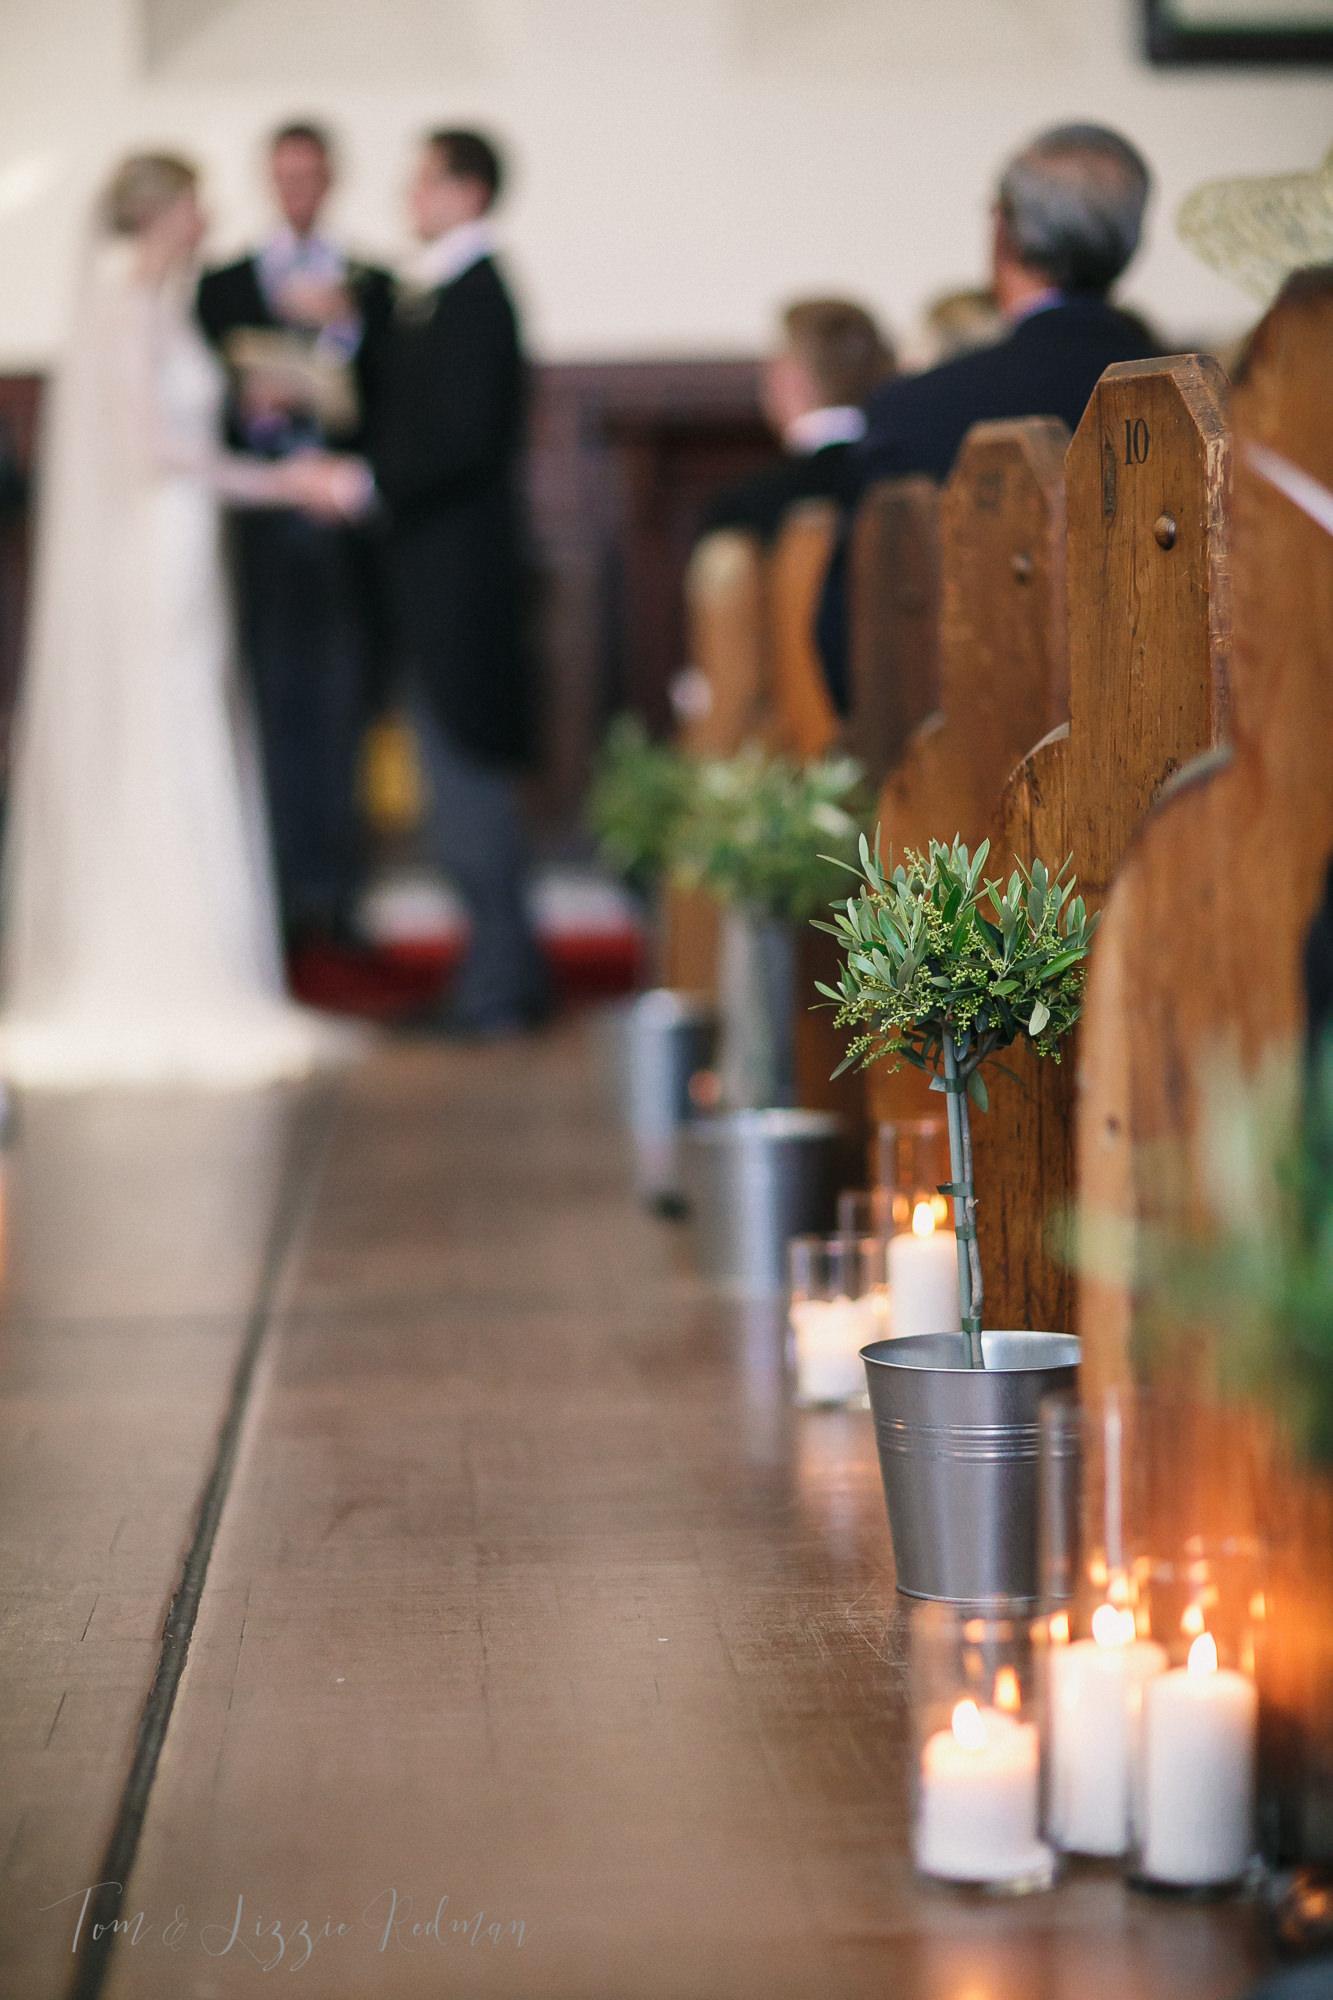 Dorset wedding photographers Tom & Lizzie Redman 020.jpg